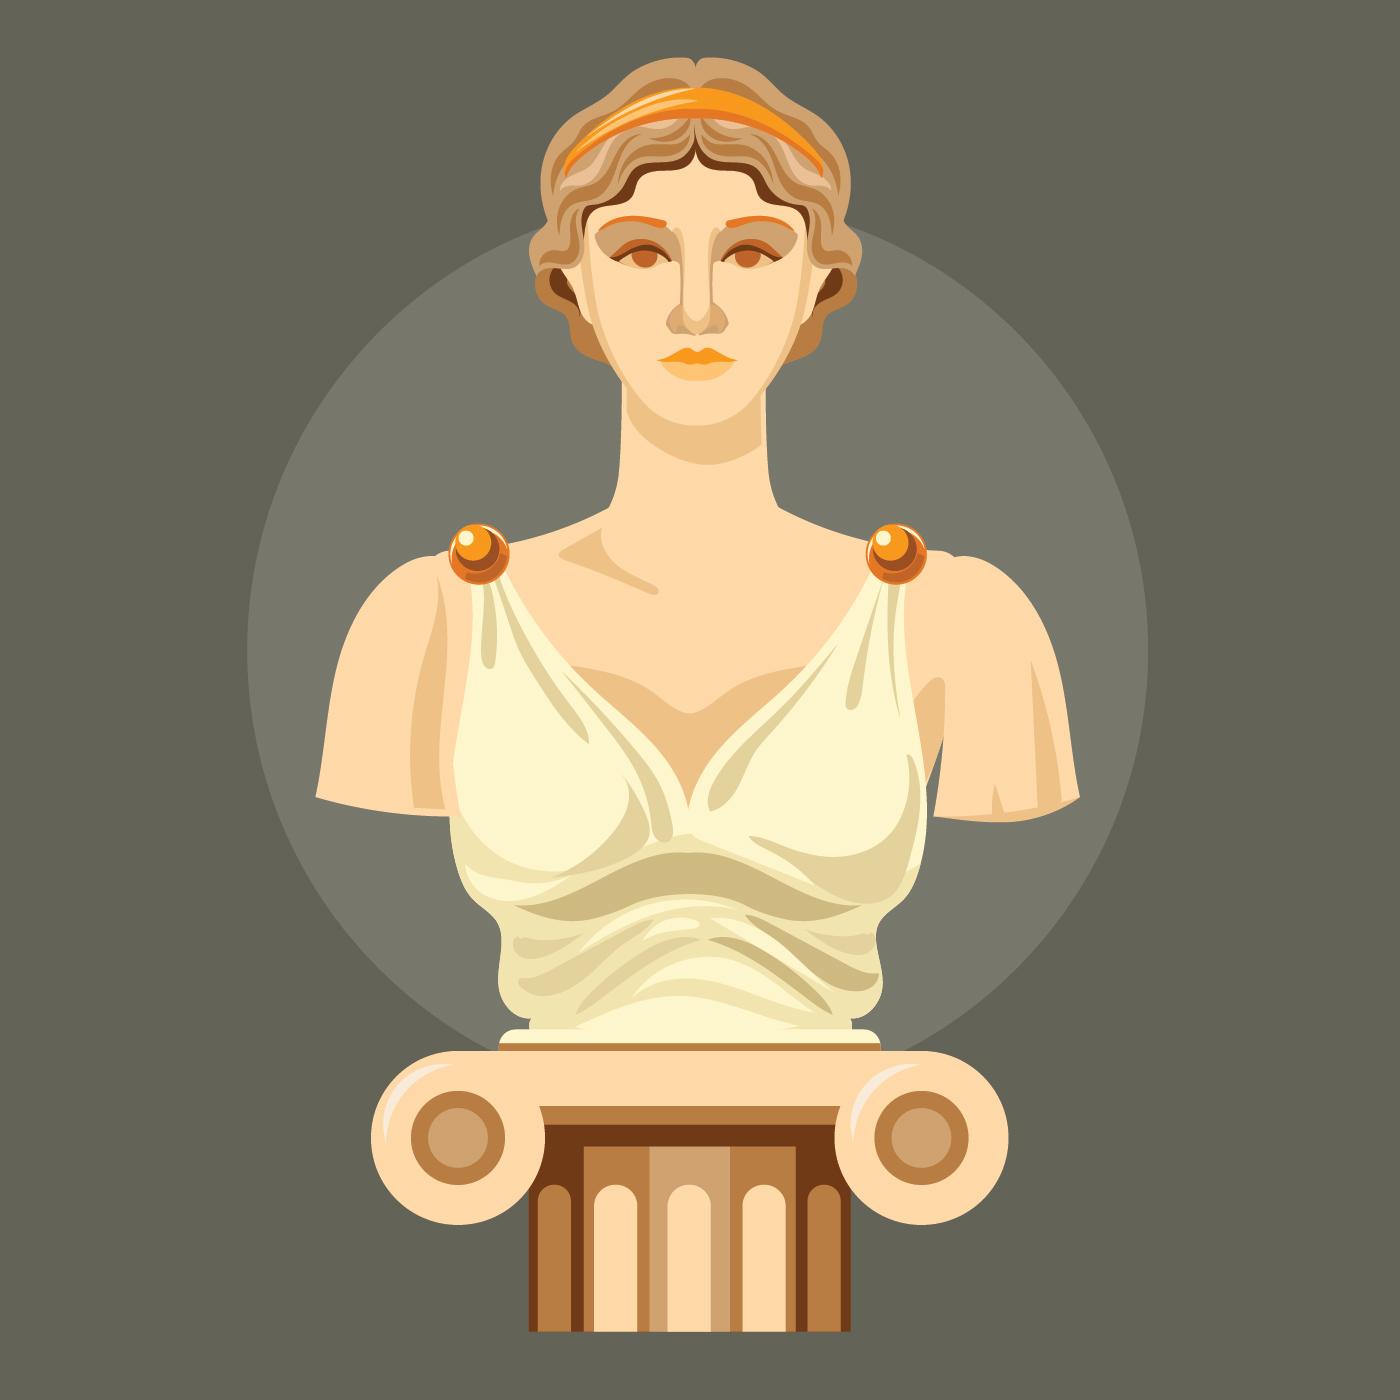 aphrodite goddess symbol - HD1400×1400